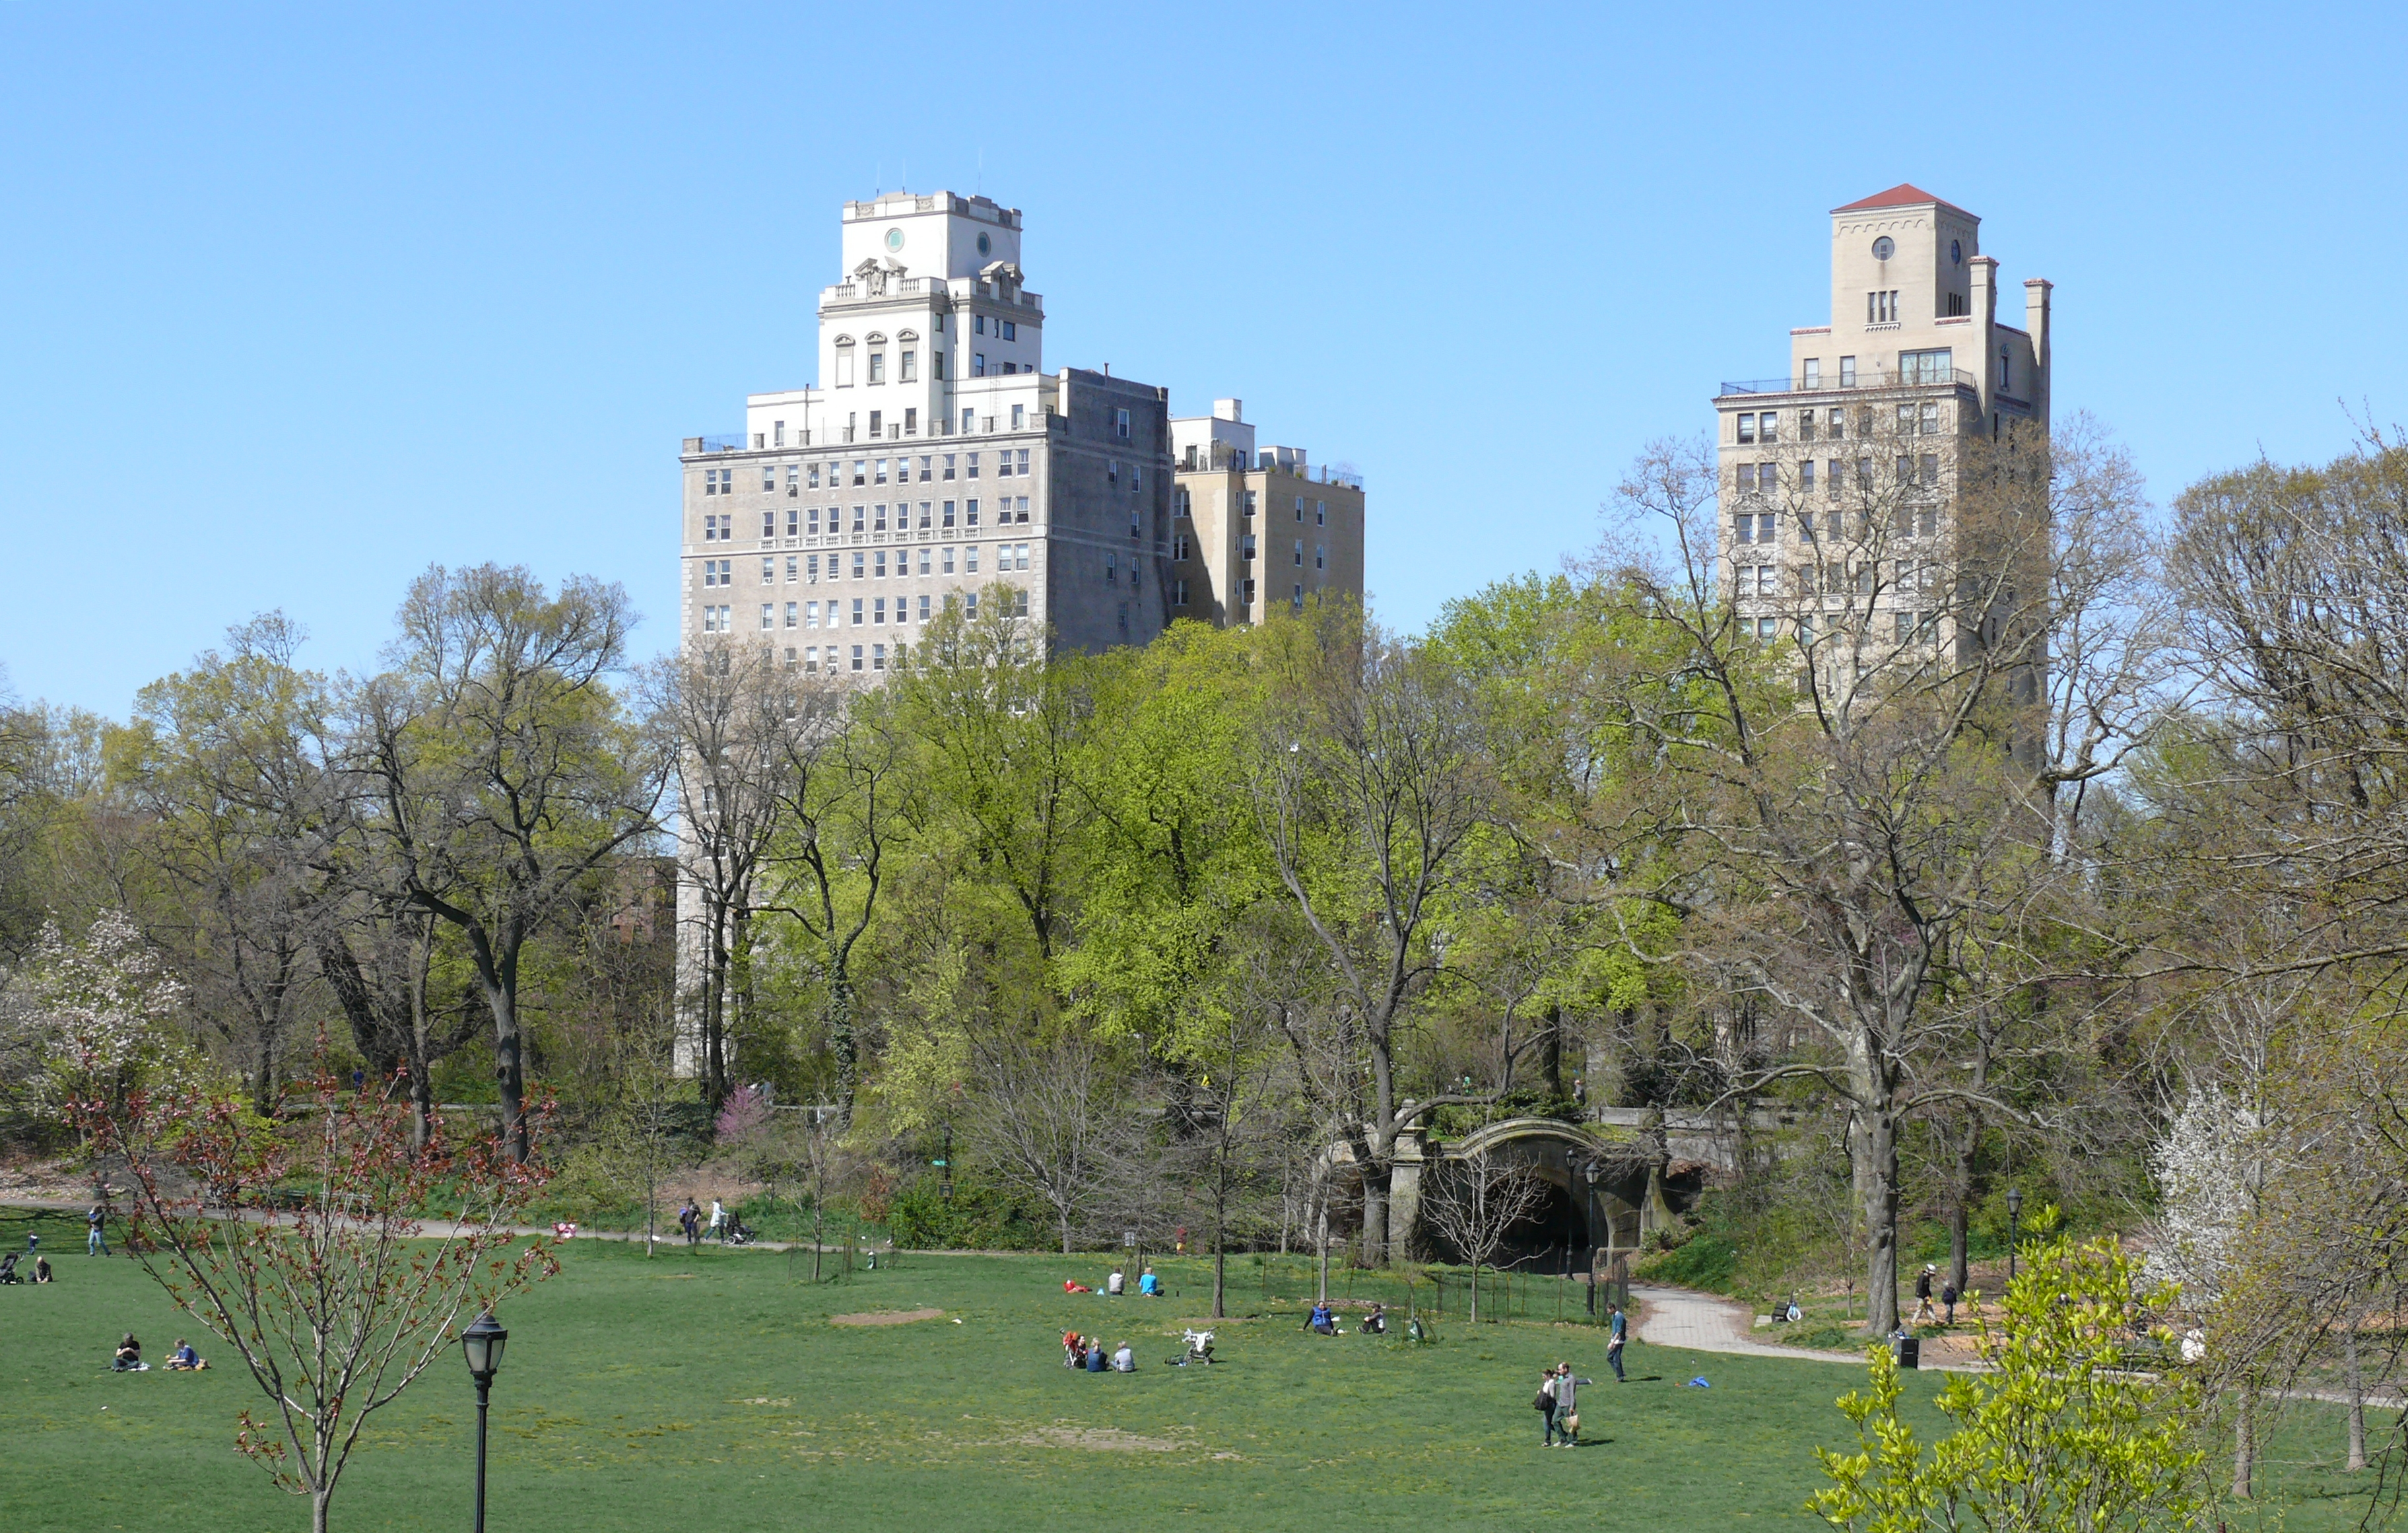 Enjoy The Beautiful Sights At Prospect Park New York